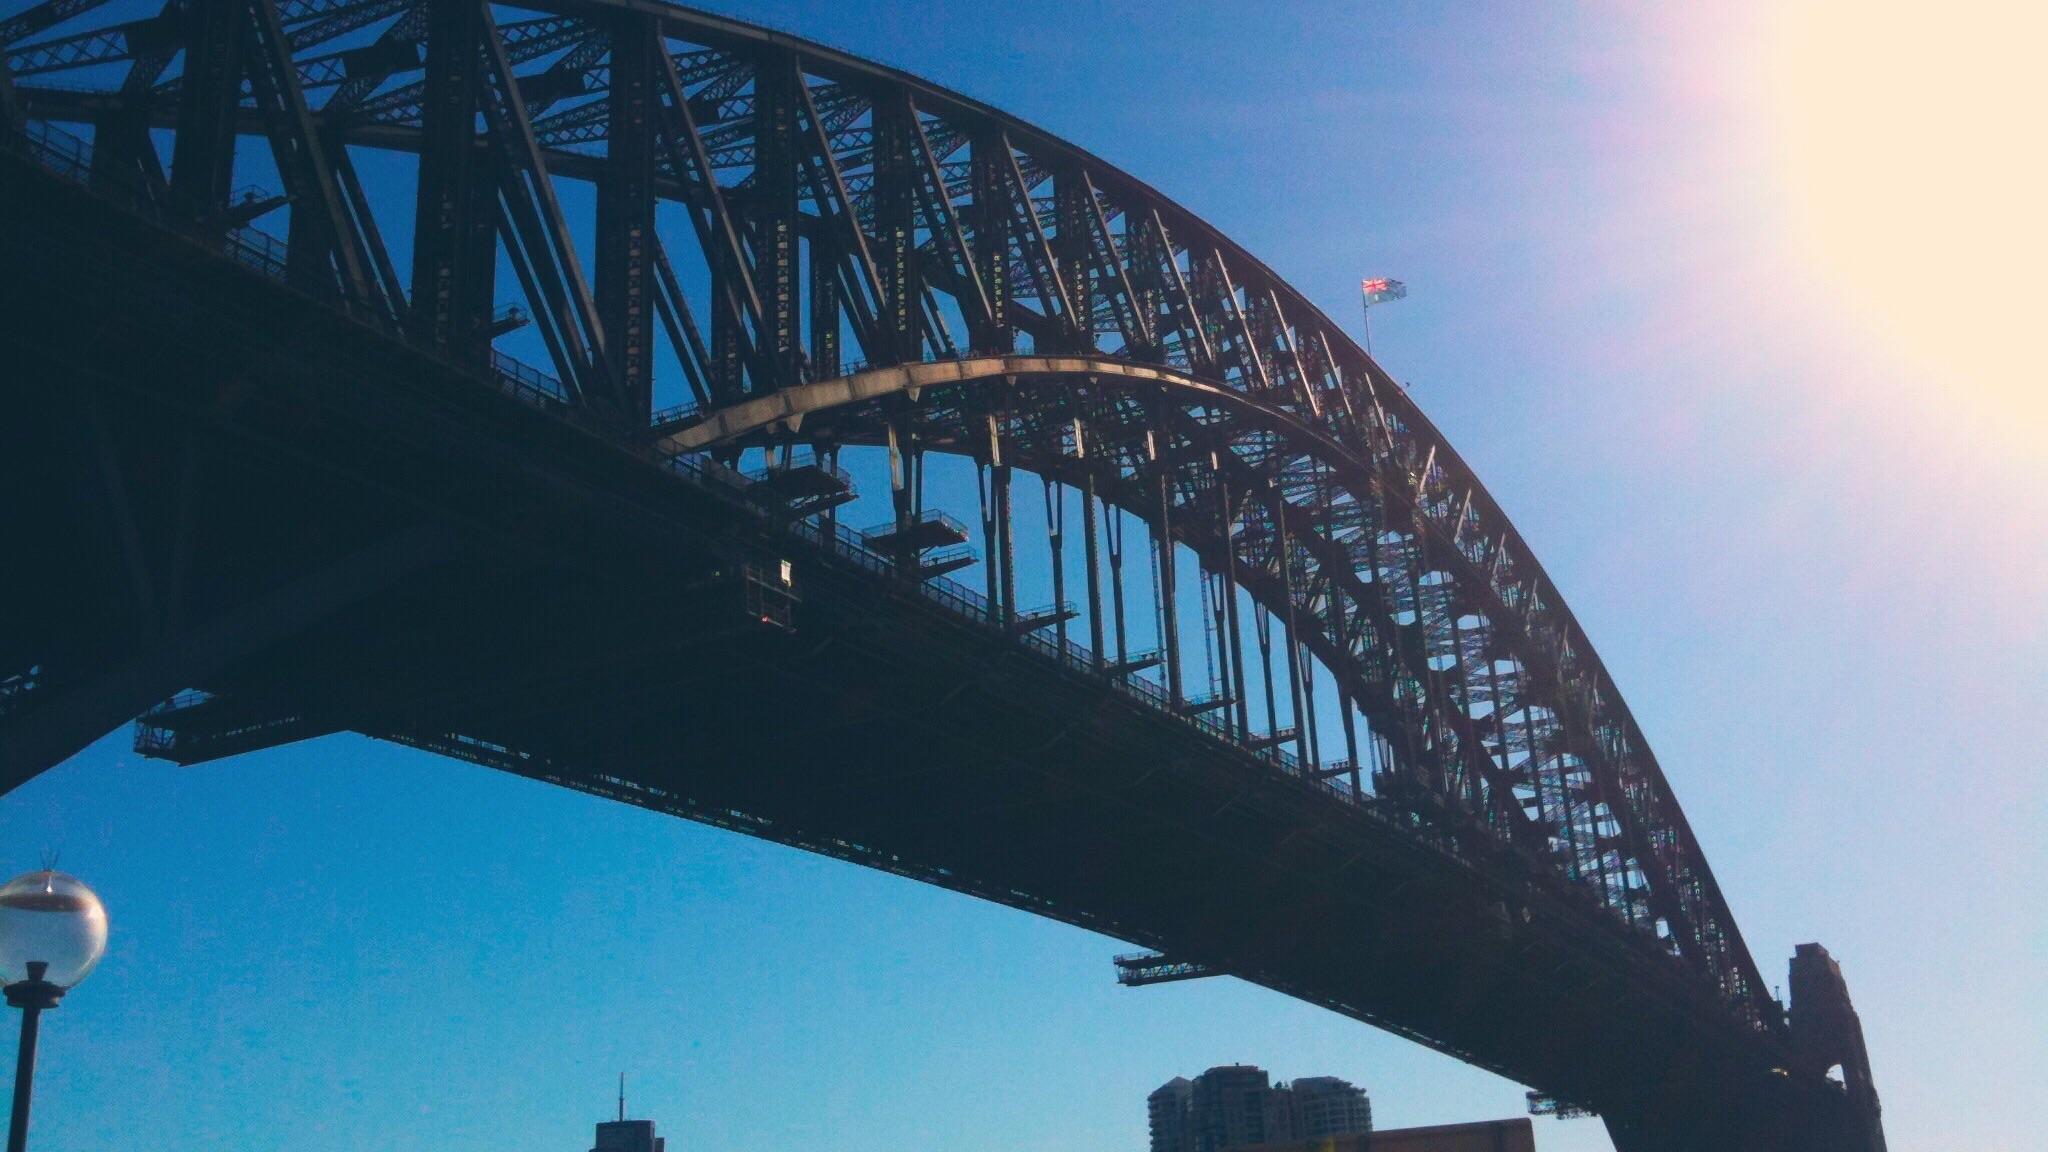 Exploring Sydney in a breeze